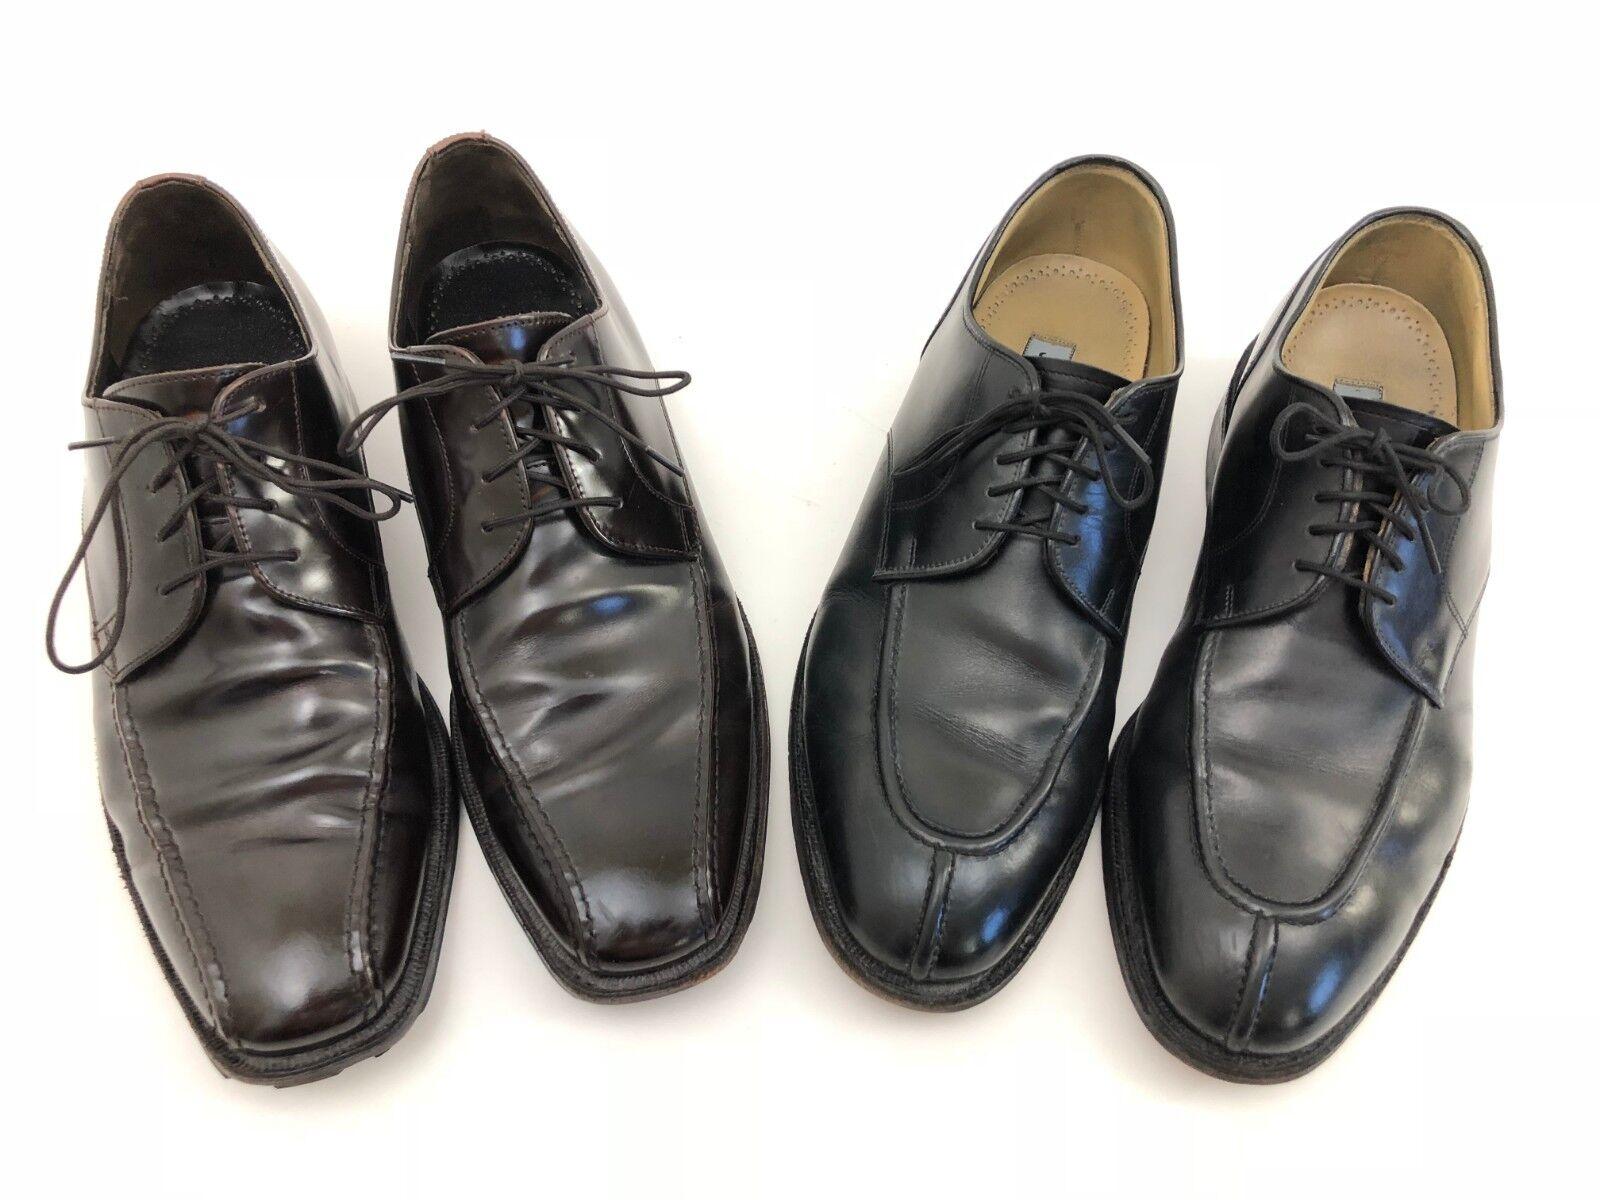 Lot Lot Lot of 2 Johnston Murphy Nero Brown Mahogany Pelle Dress Shoes Uomo Size 9 M 109566